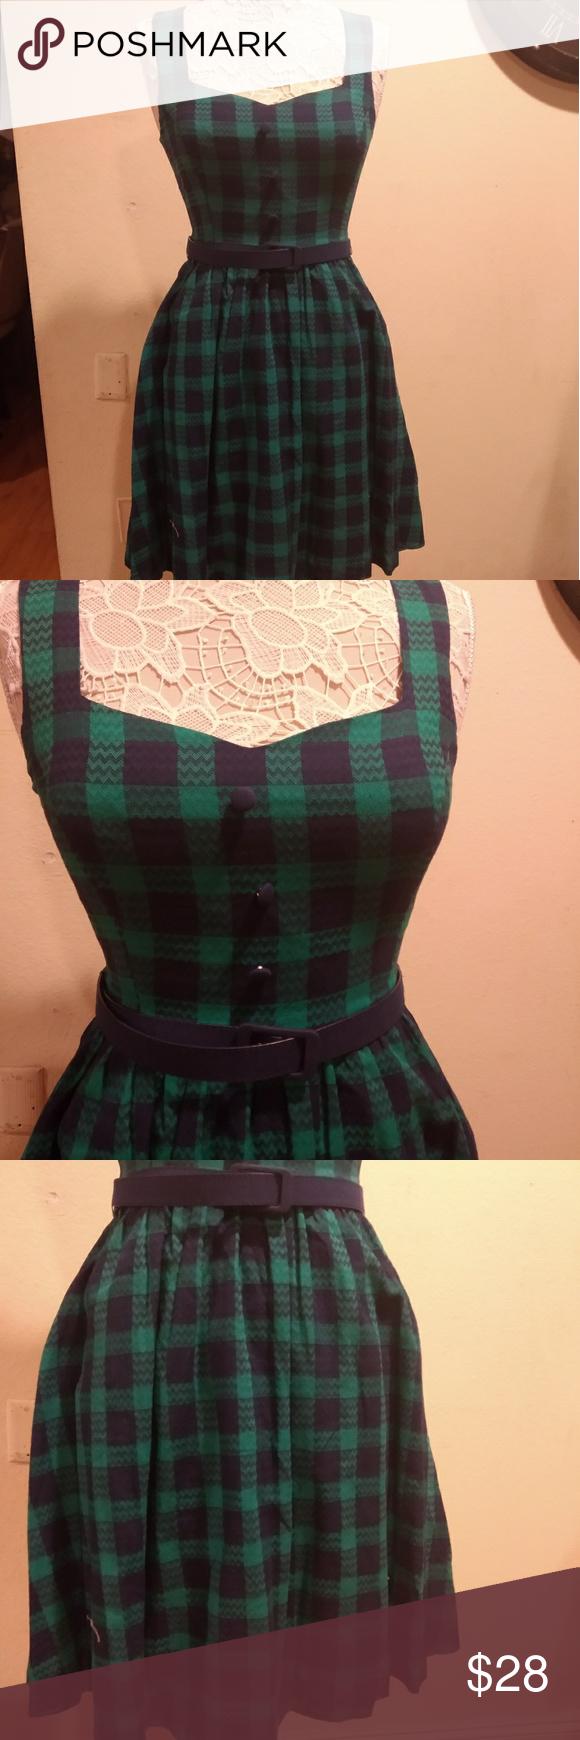 Modcloth Green Plaid Dress Green Plaid Dress Mod Cloth Dresses Plaid Dress [ 1740 x 580 Pixel ]